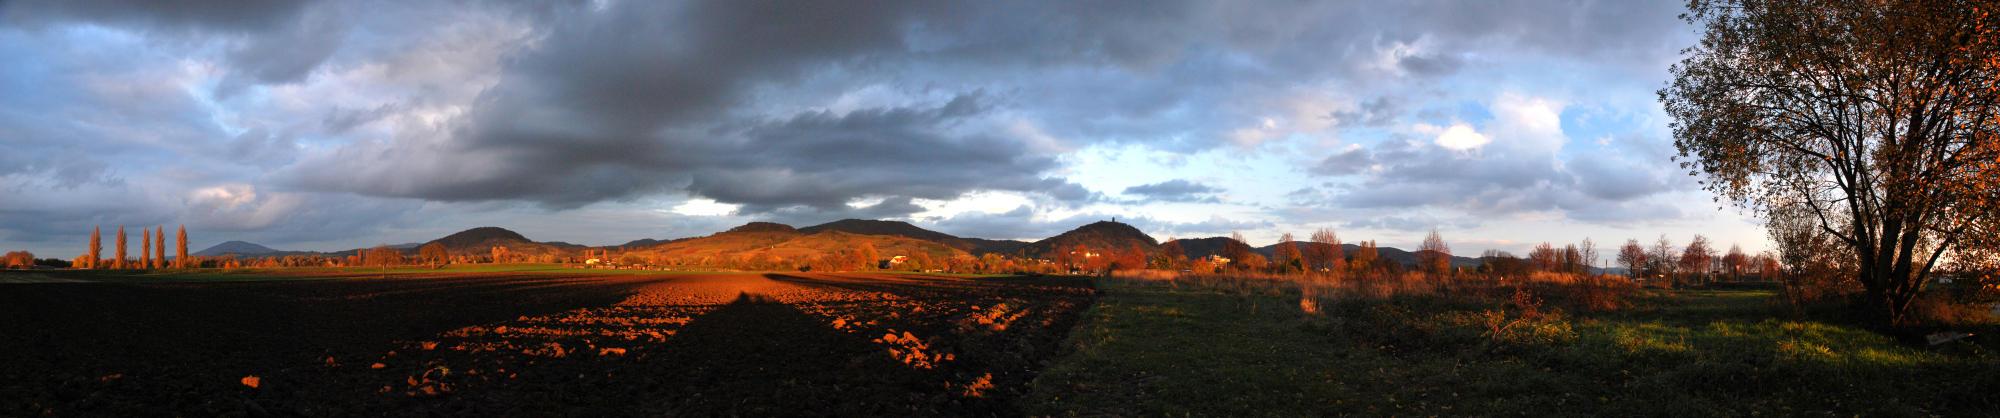 Bergsträsser Hügelpanorama 2